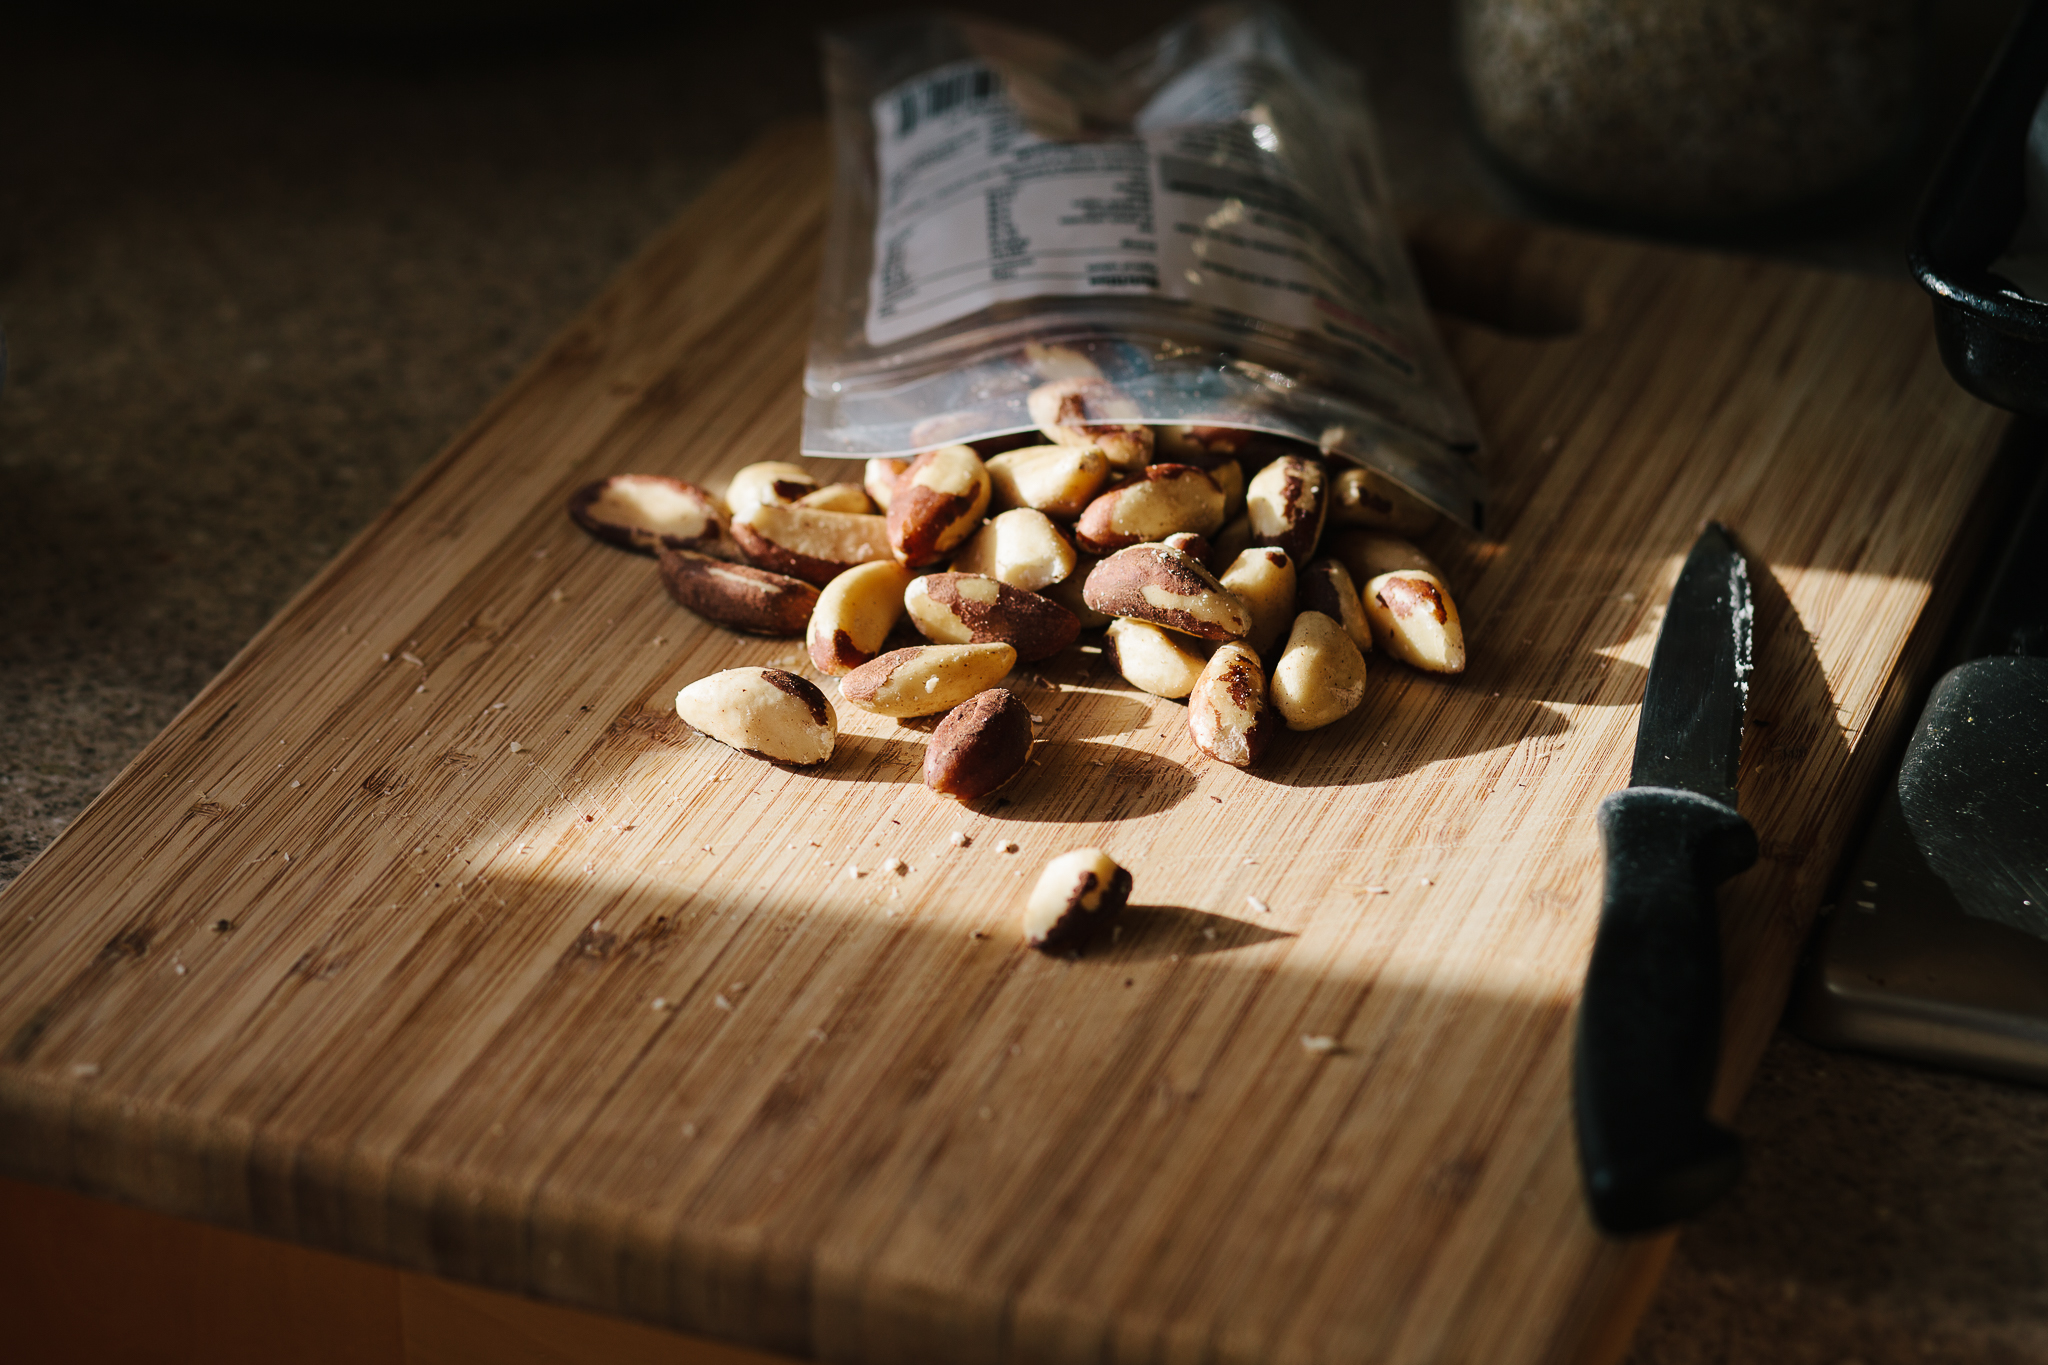 7/52 - Making homemade granola (Canon 5D MkII)